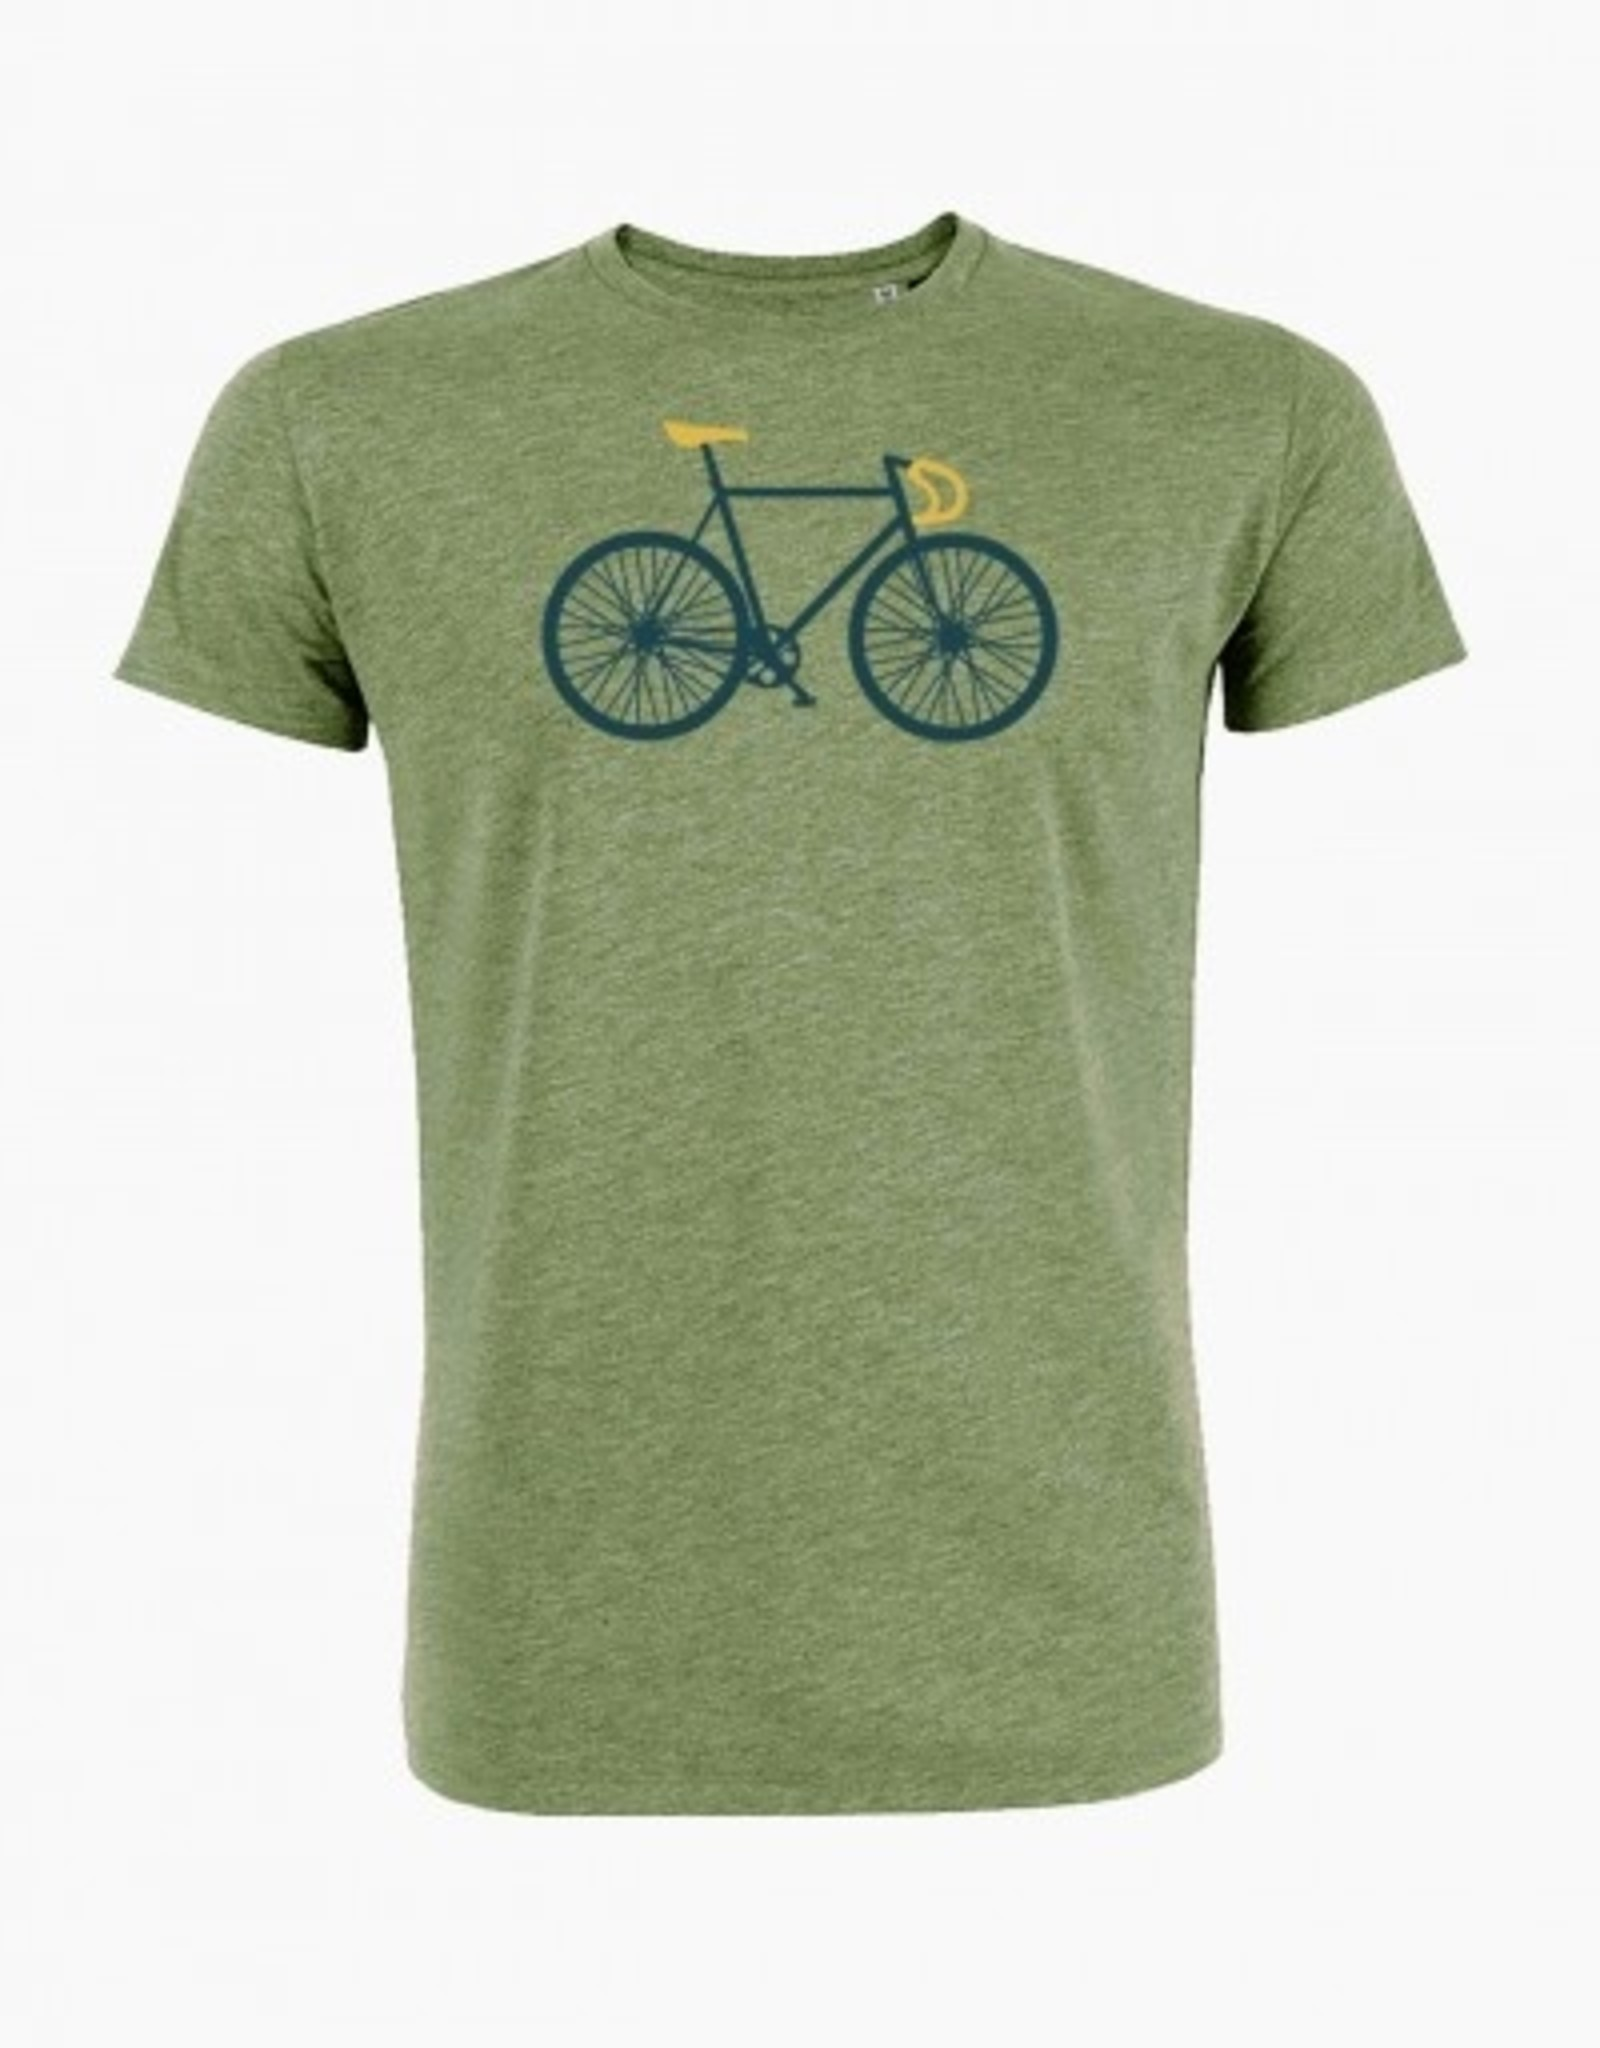 Greenbomb T-SHIRT BIKE GREEN